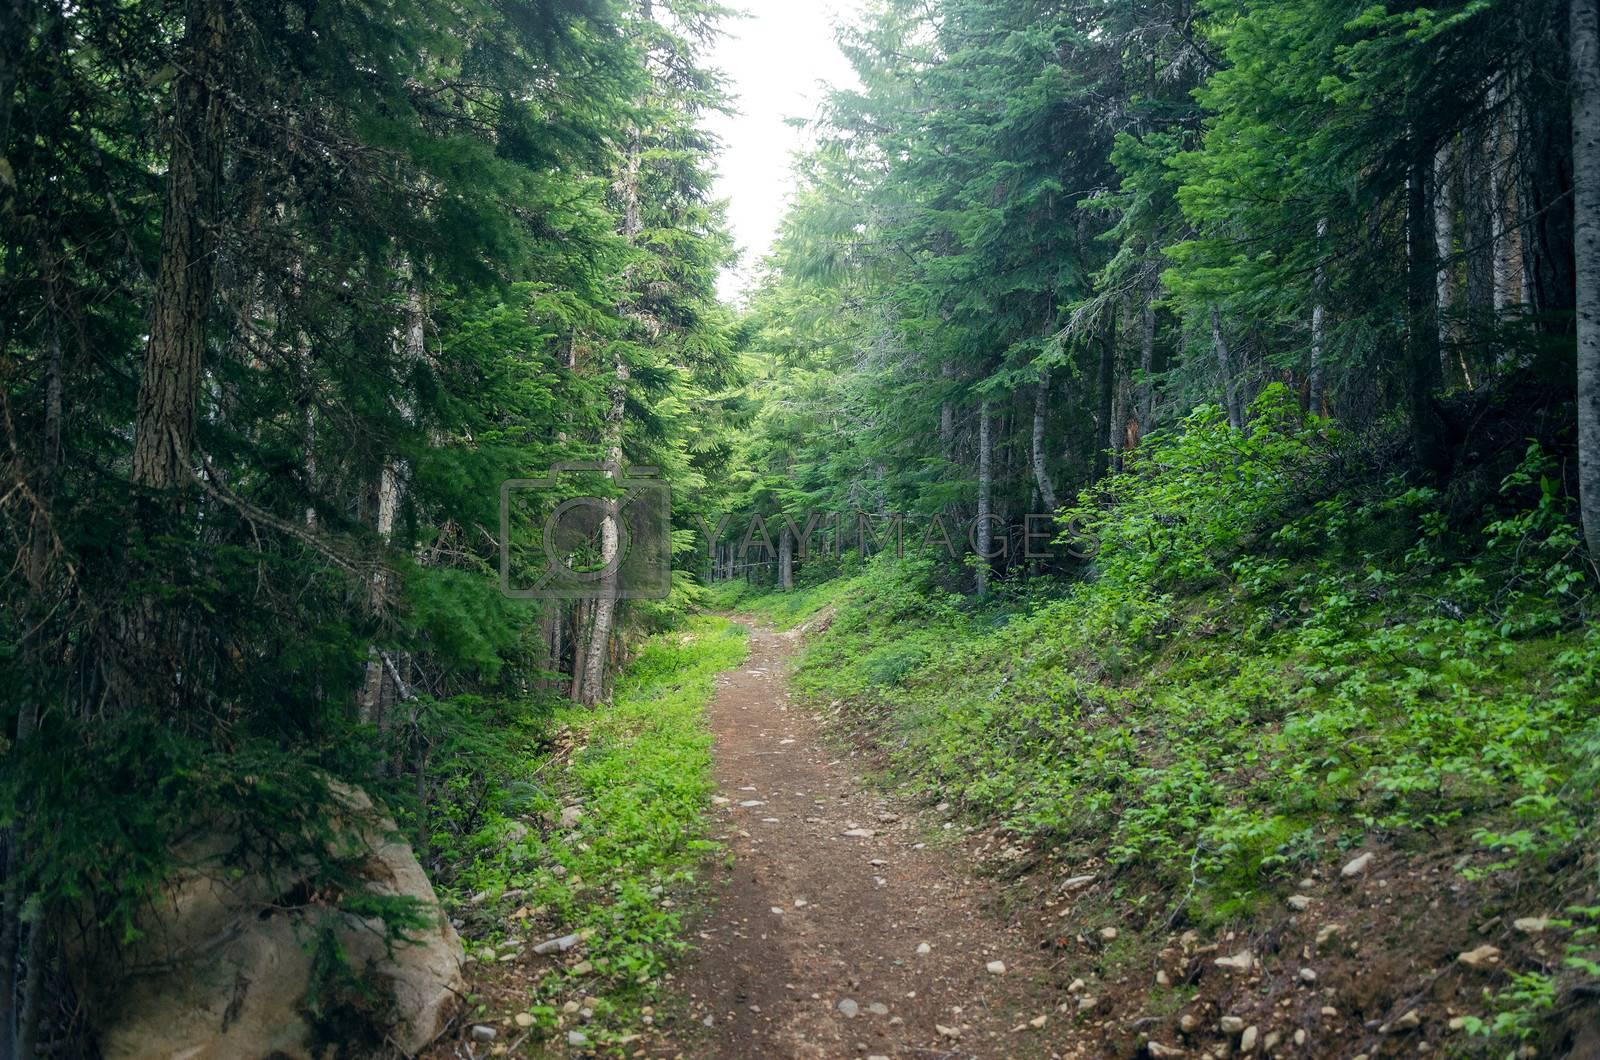 Path running through an evergreen forest in Oregon